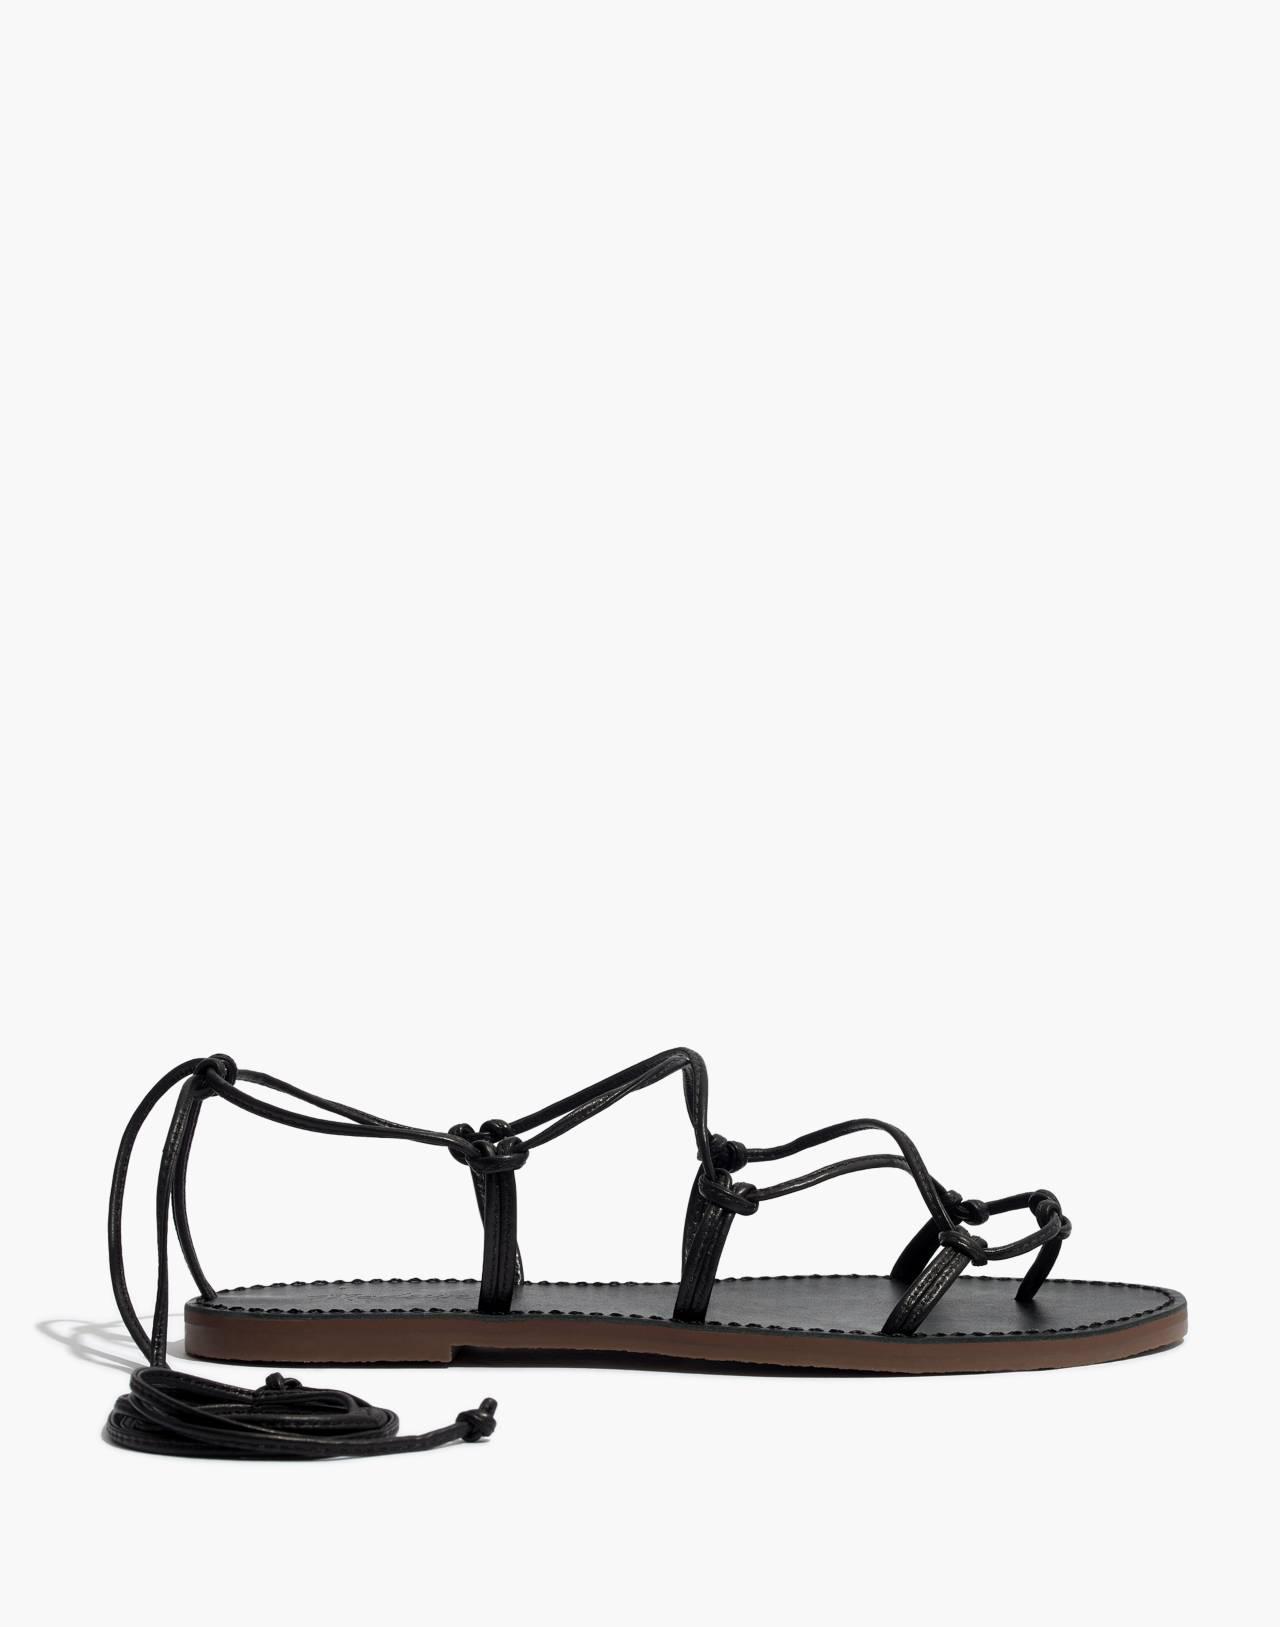 The Boardwalk Lace-Up Sandal in true black image 3